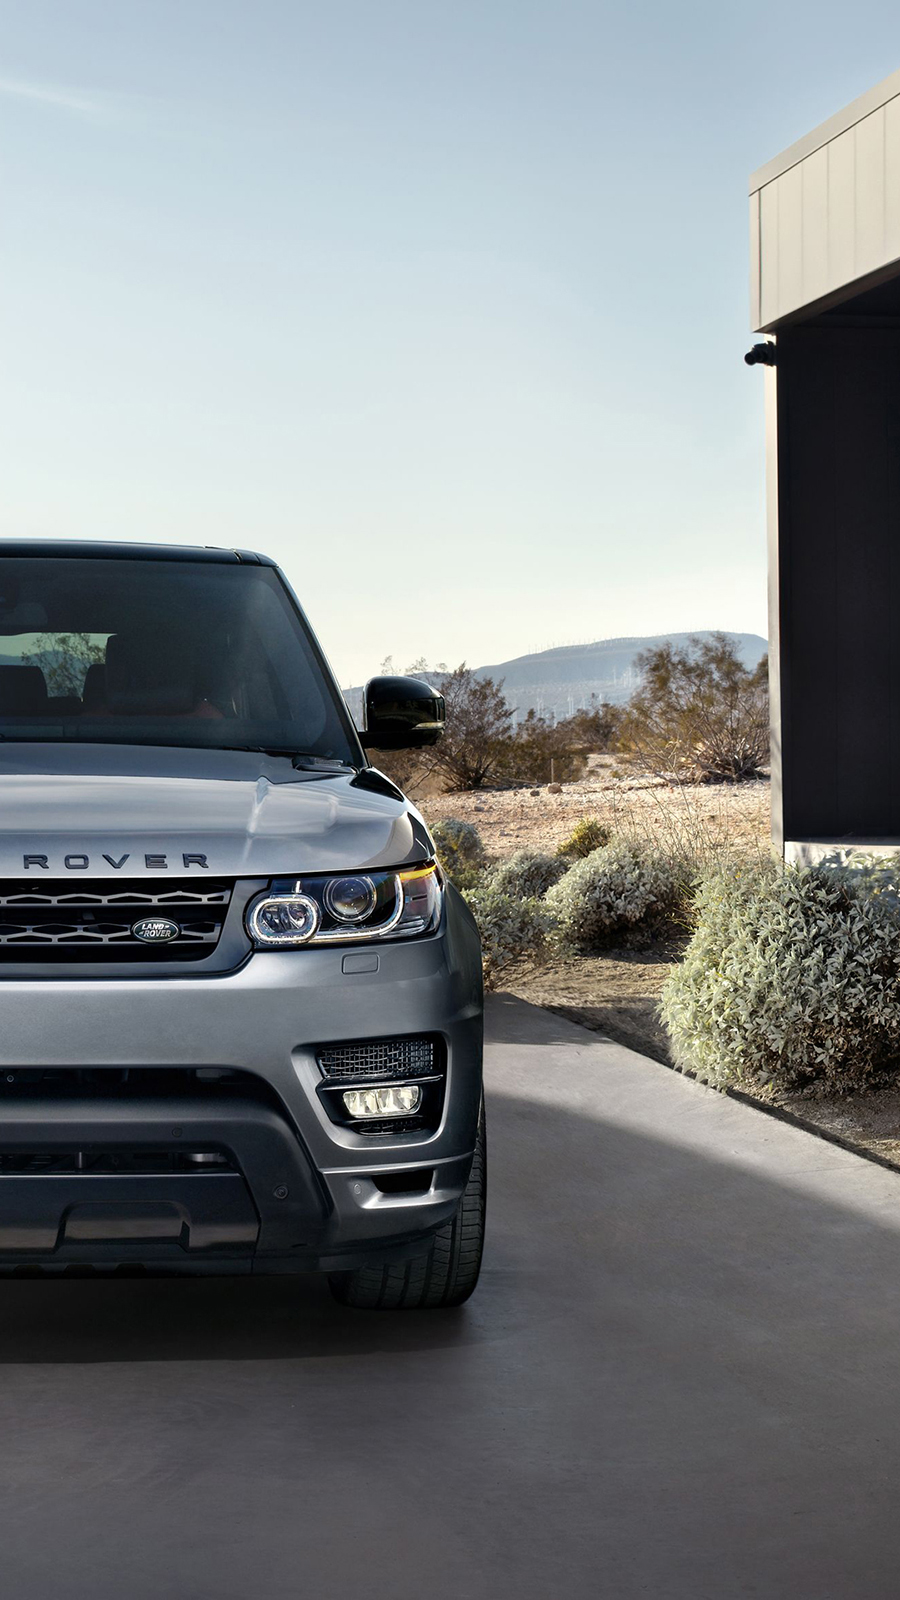 2014 Range Rover Sport Best Wallpapers Free Download